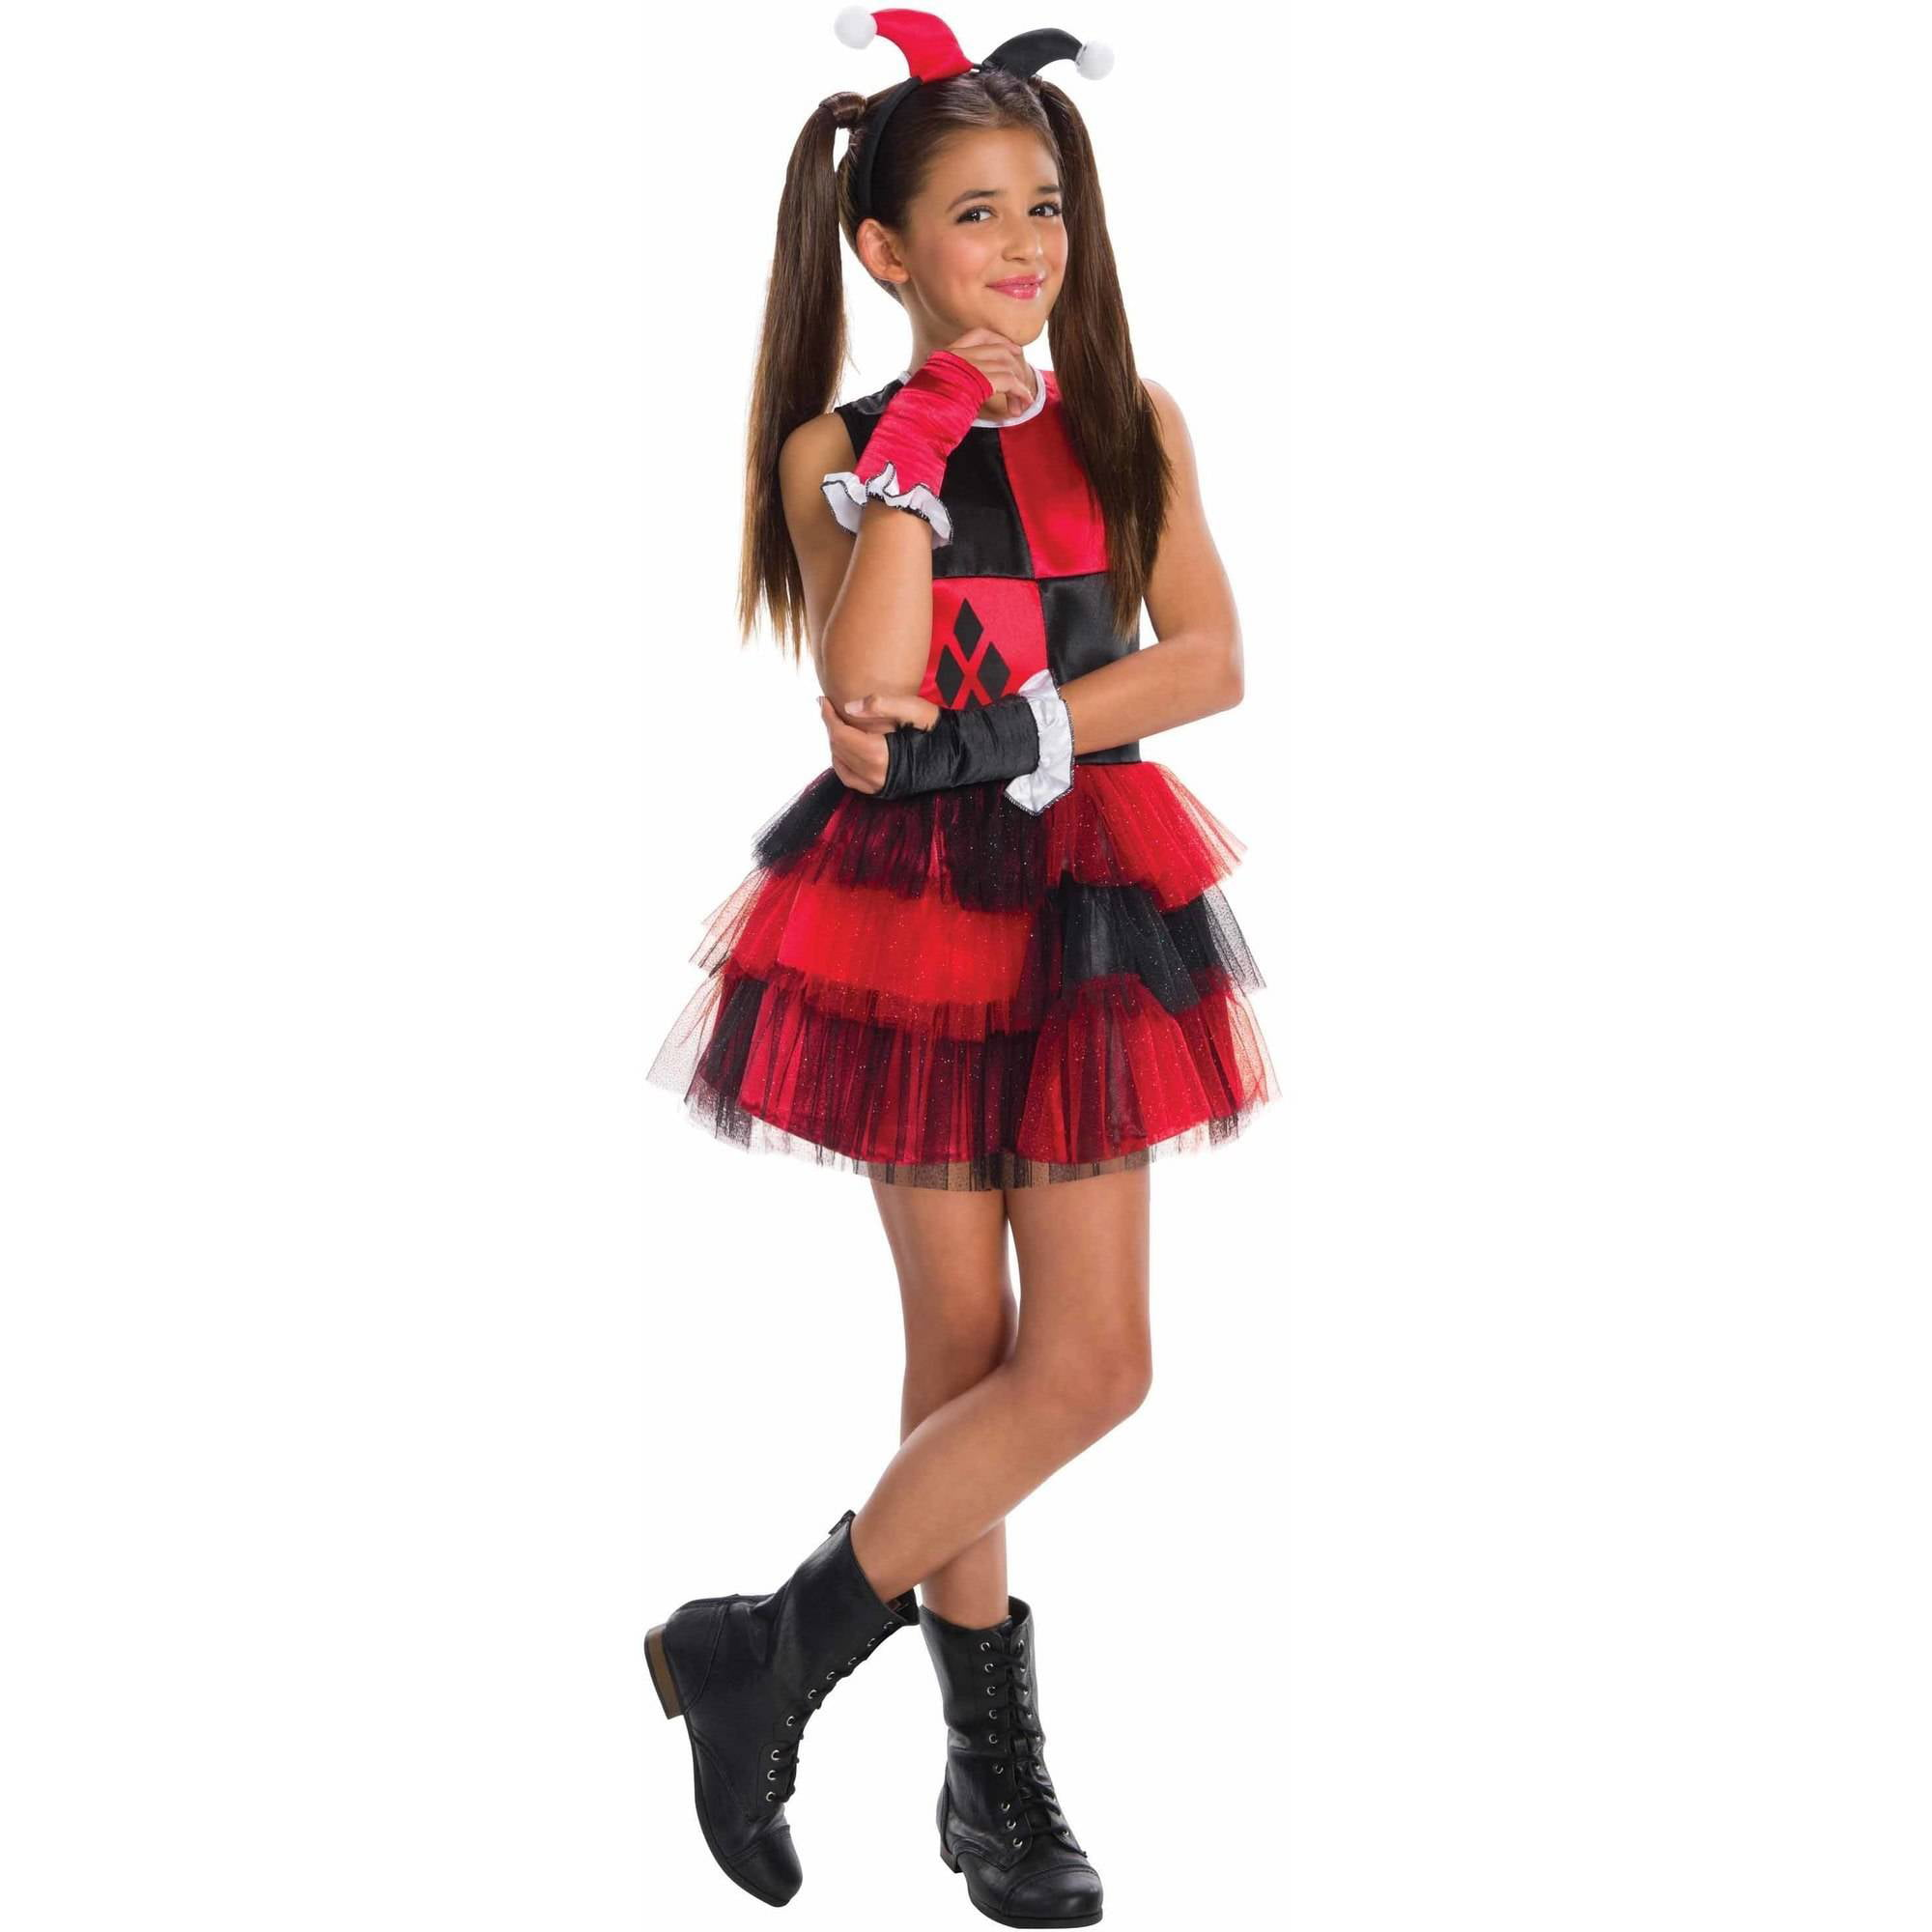 Harley Quinn Child's Costume, Medium (8-10) by Generic